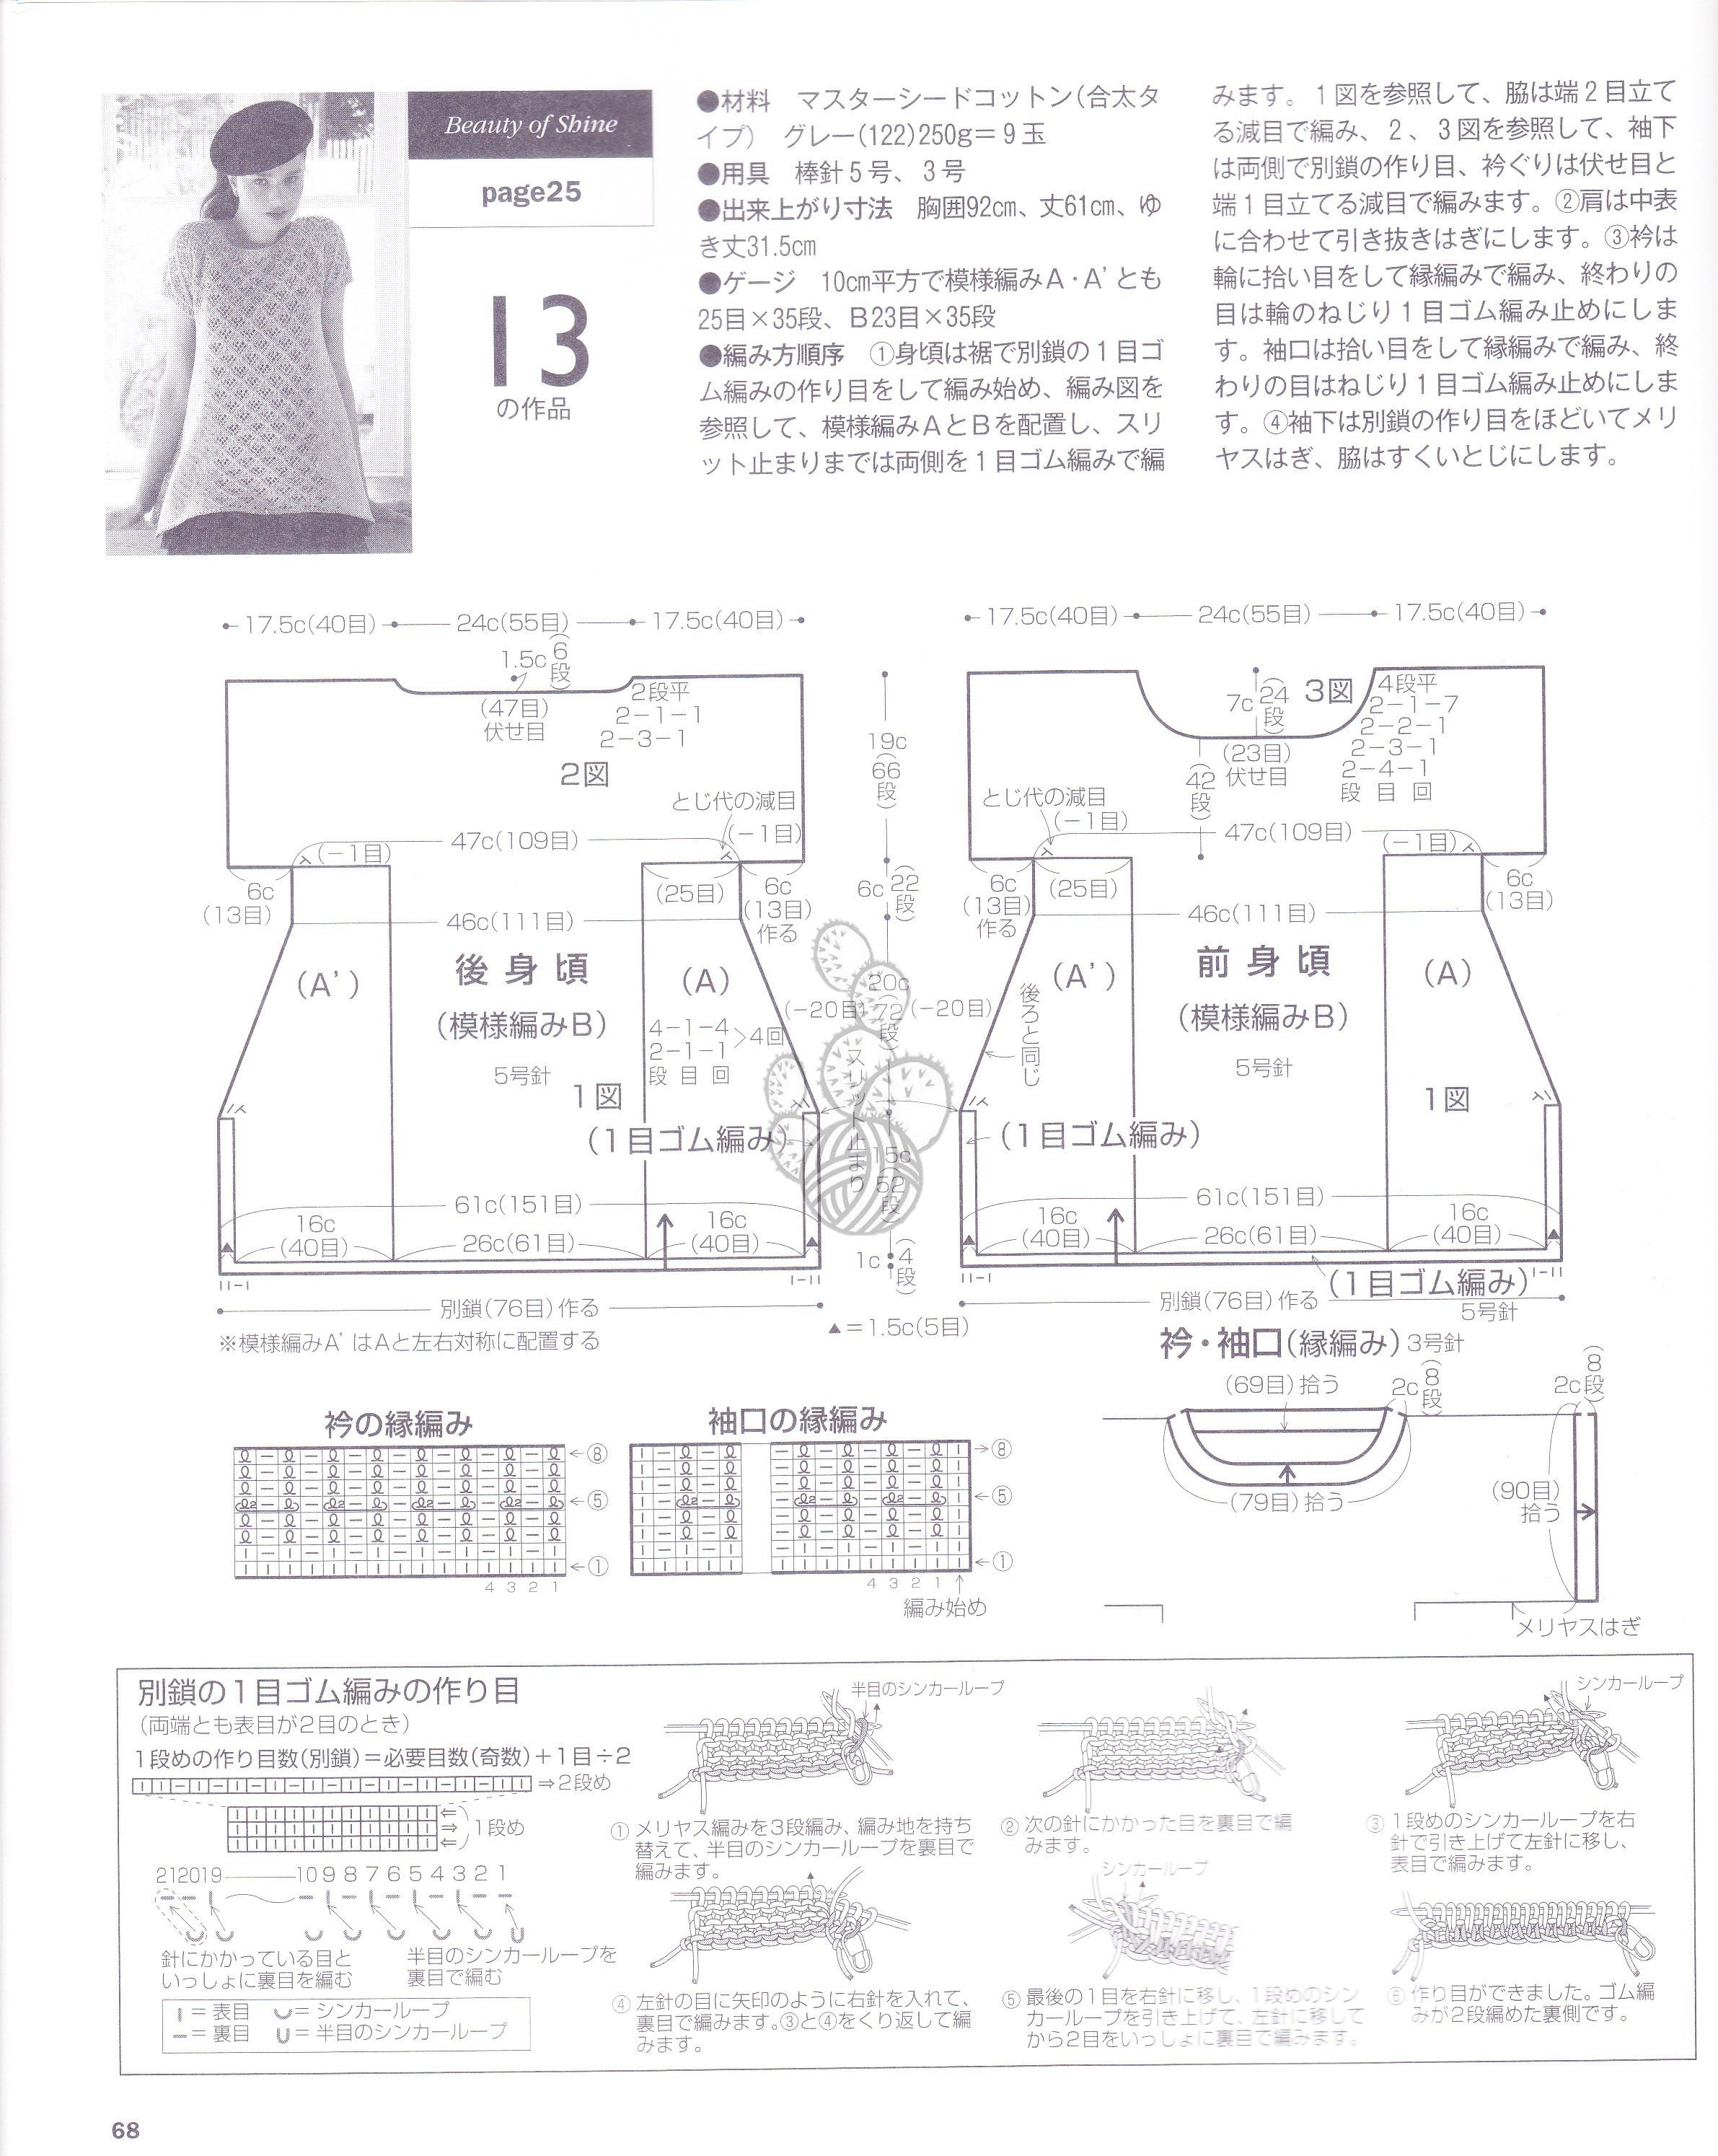 conew_img_0068.jpg